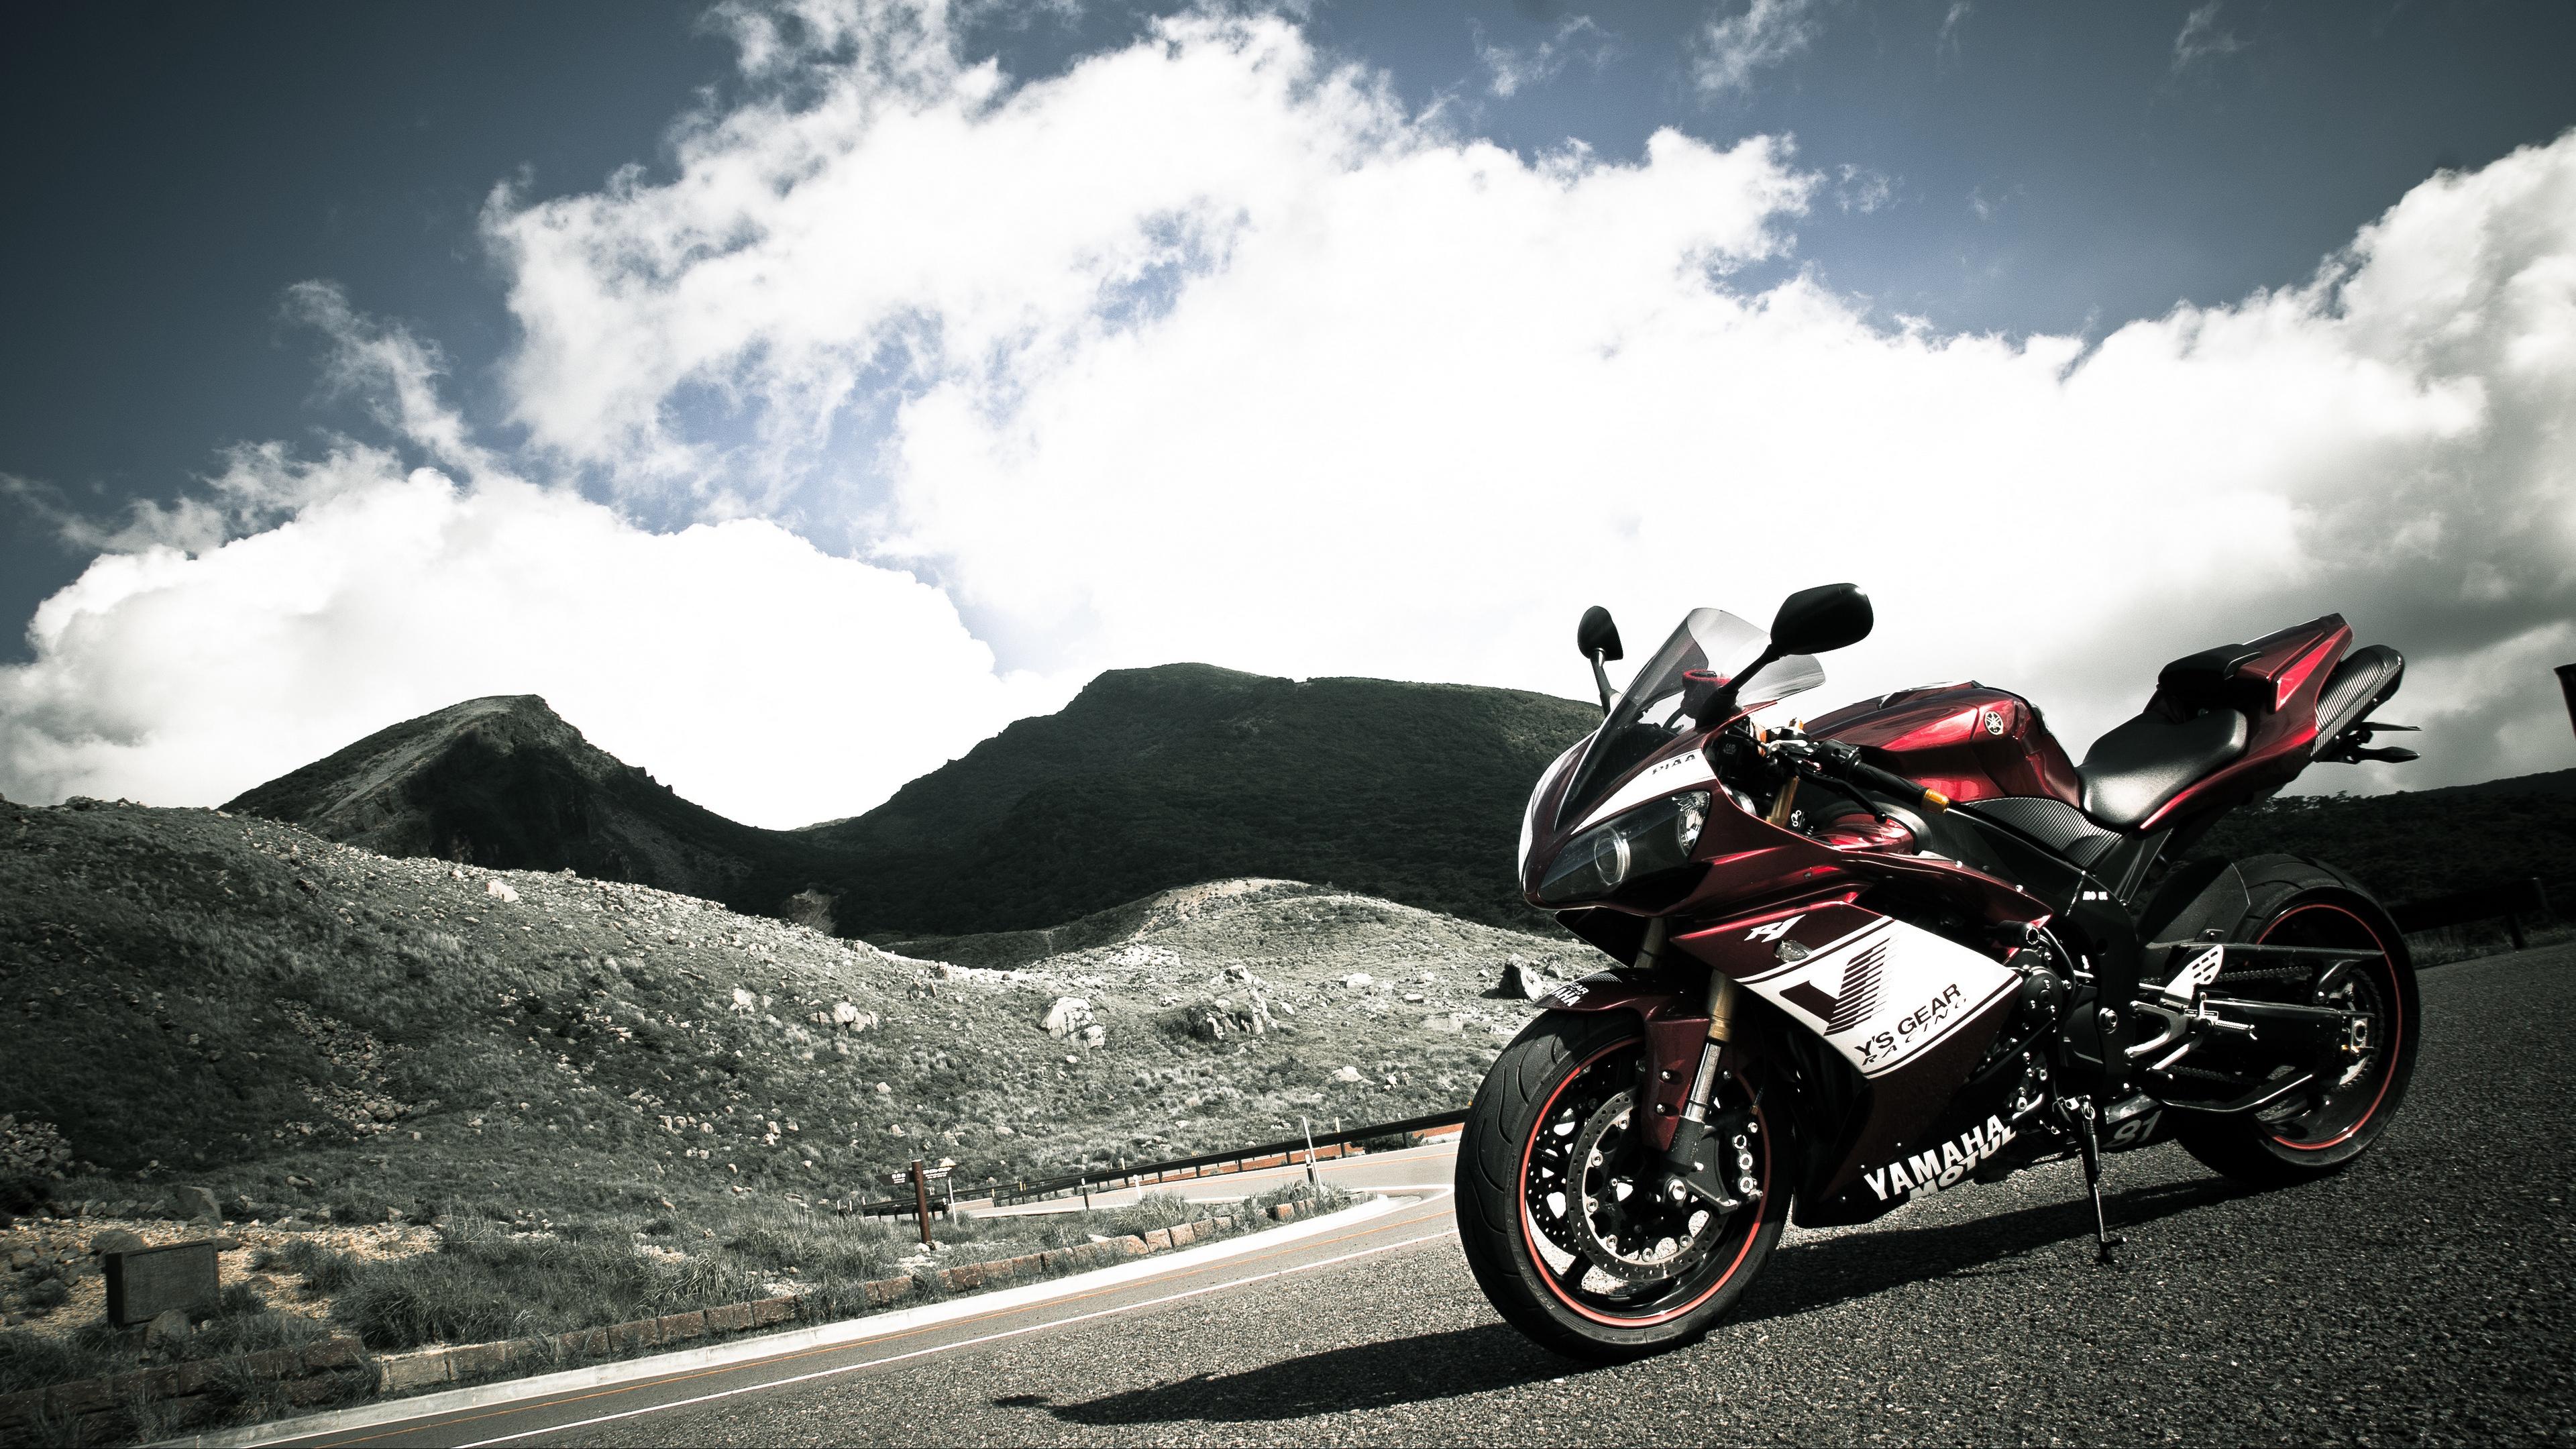 yamaha r1 motorcycle sportbike 4k 1536018796 - yamaha r1, motorcycle, sportbike 4k - yamaha r1, Sportbike, Motorcycle